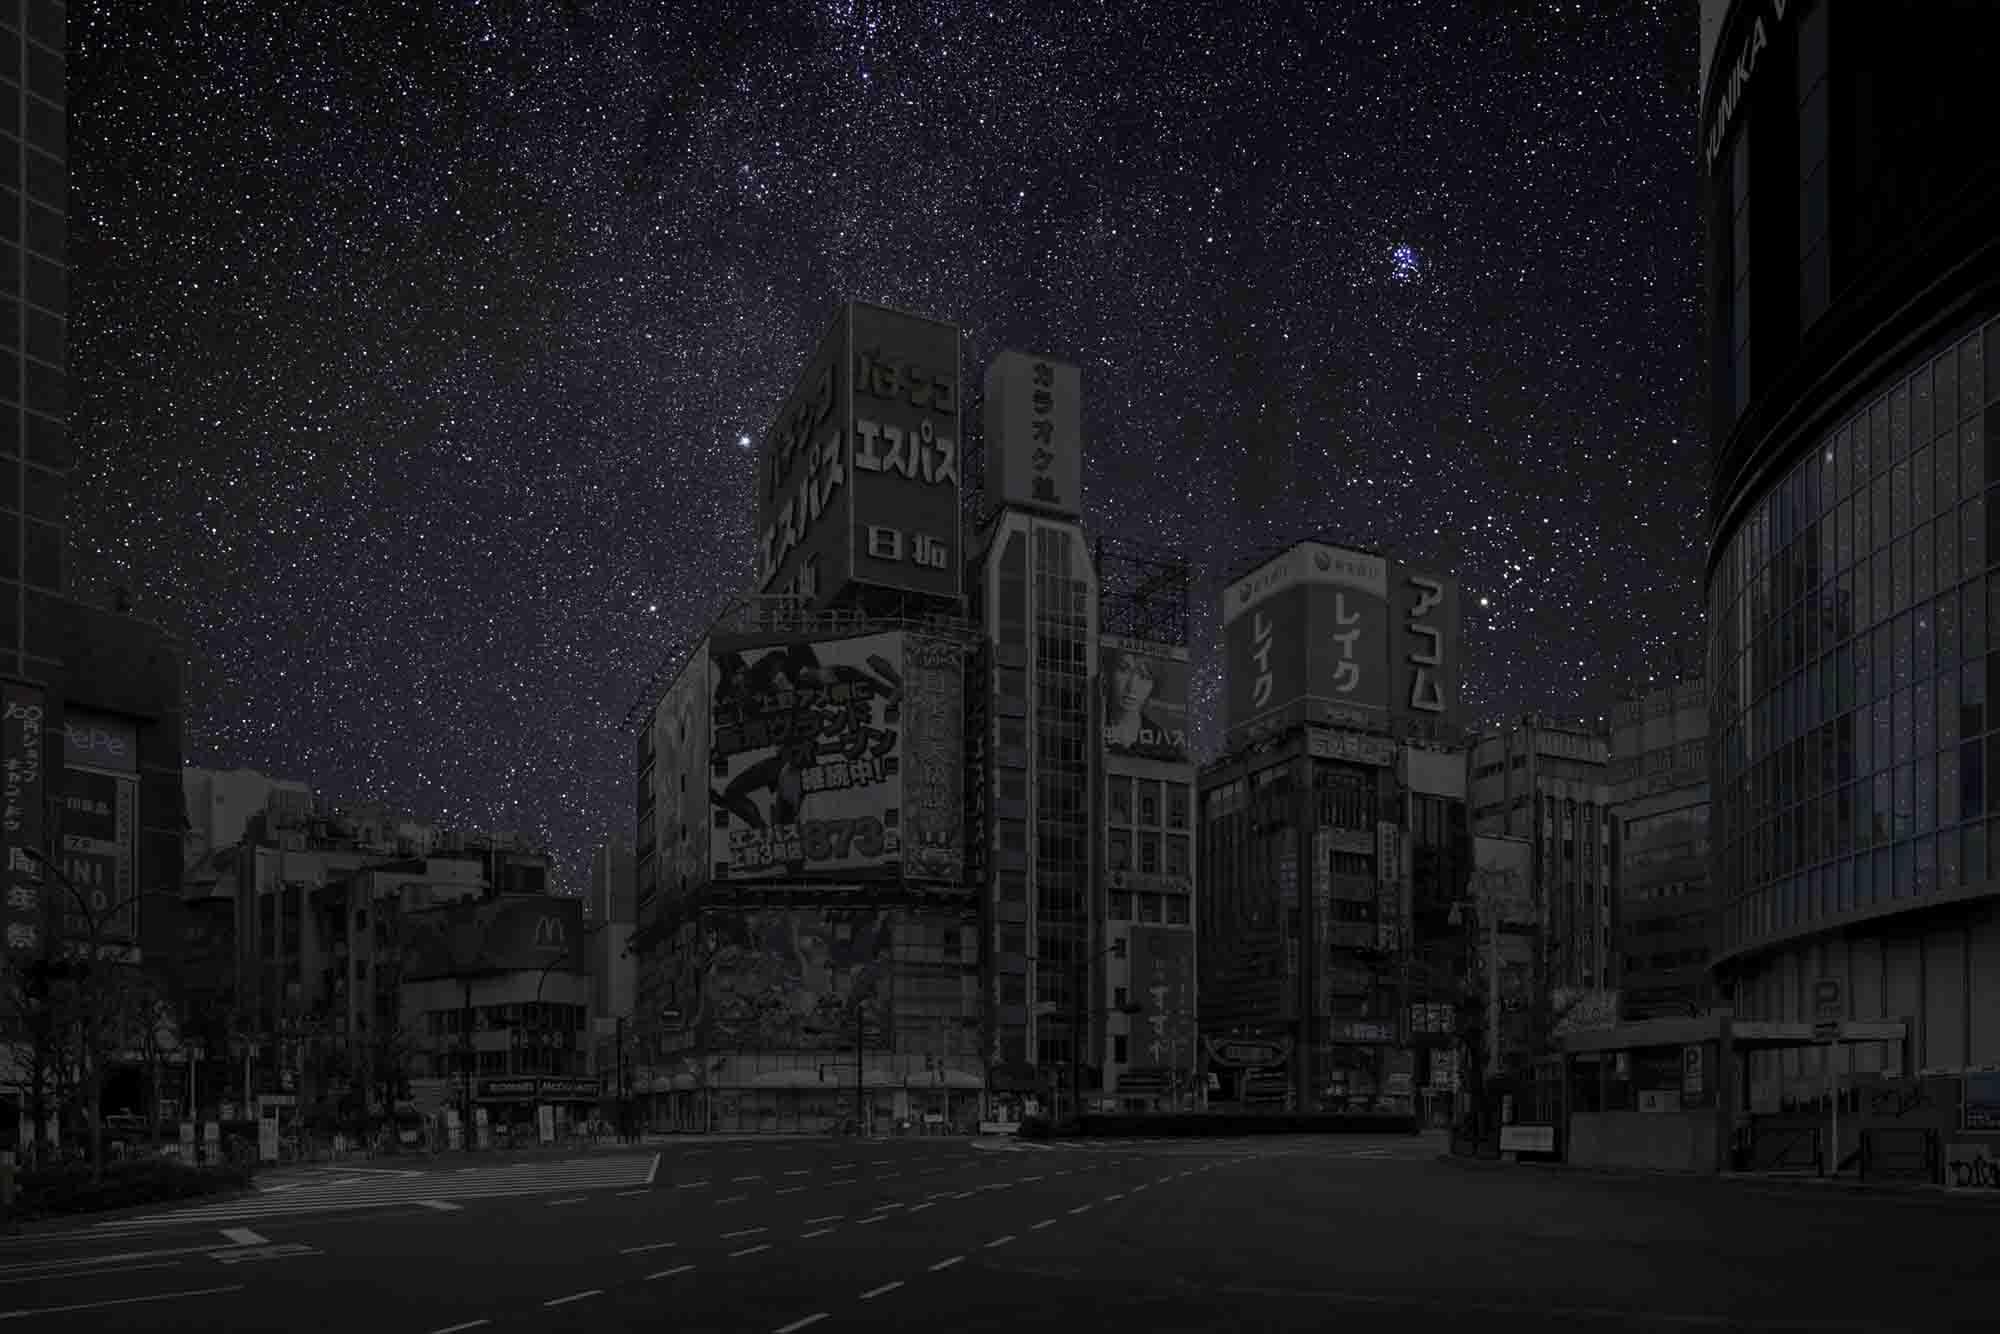 Tokyo 35° 41' 36'' N 2011-11-16 lst 23:16<br/>Darkened Cities - Villes éteintes